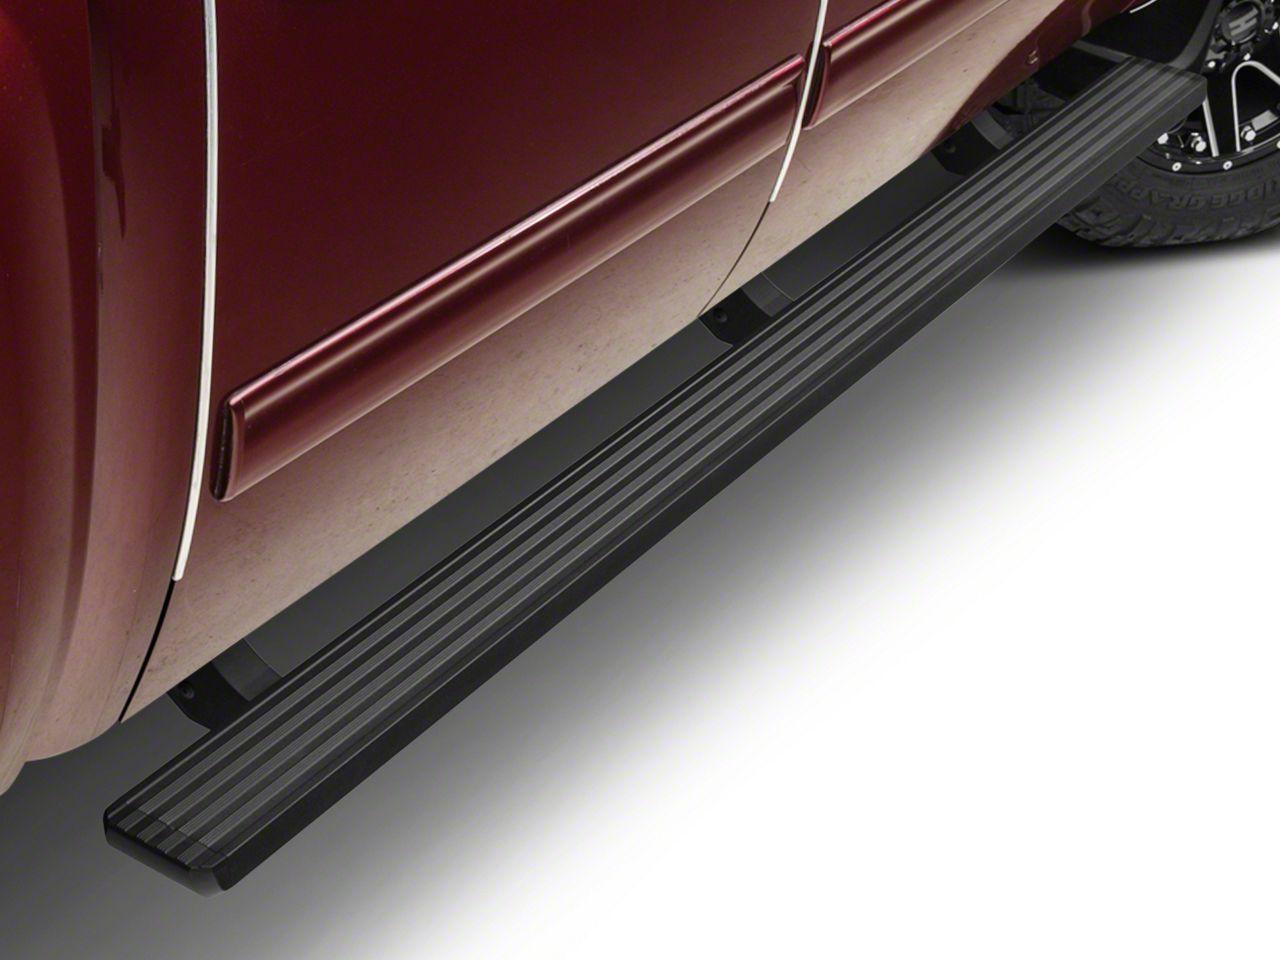 Barricade Aluminum Running Boards - Black (07-13 Silverado 1500 Extended Cab, Crew Cab)